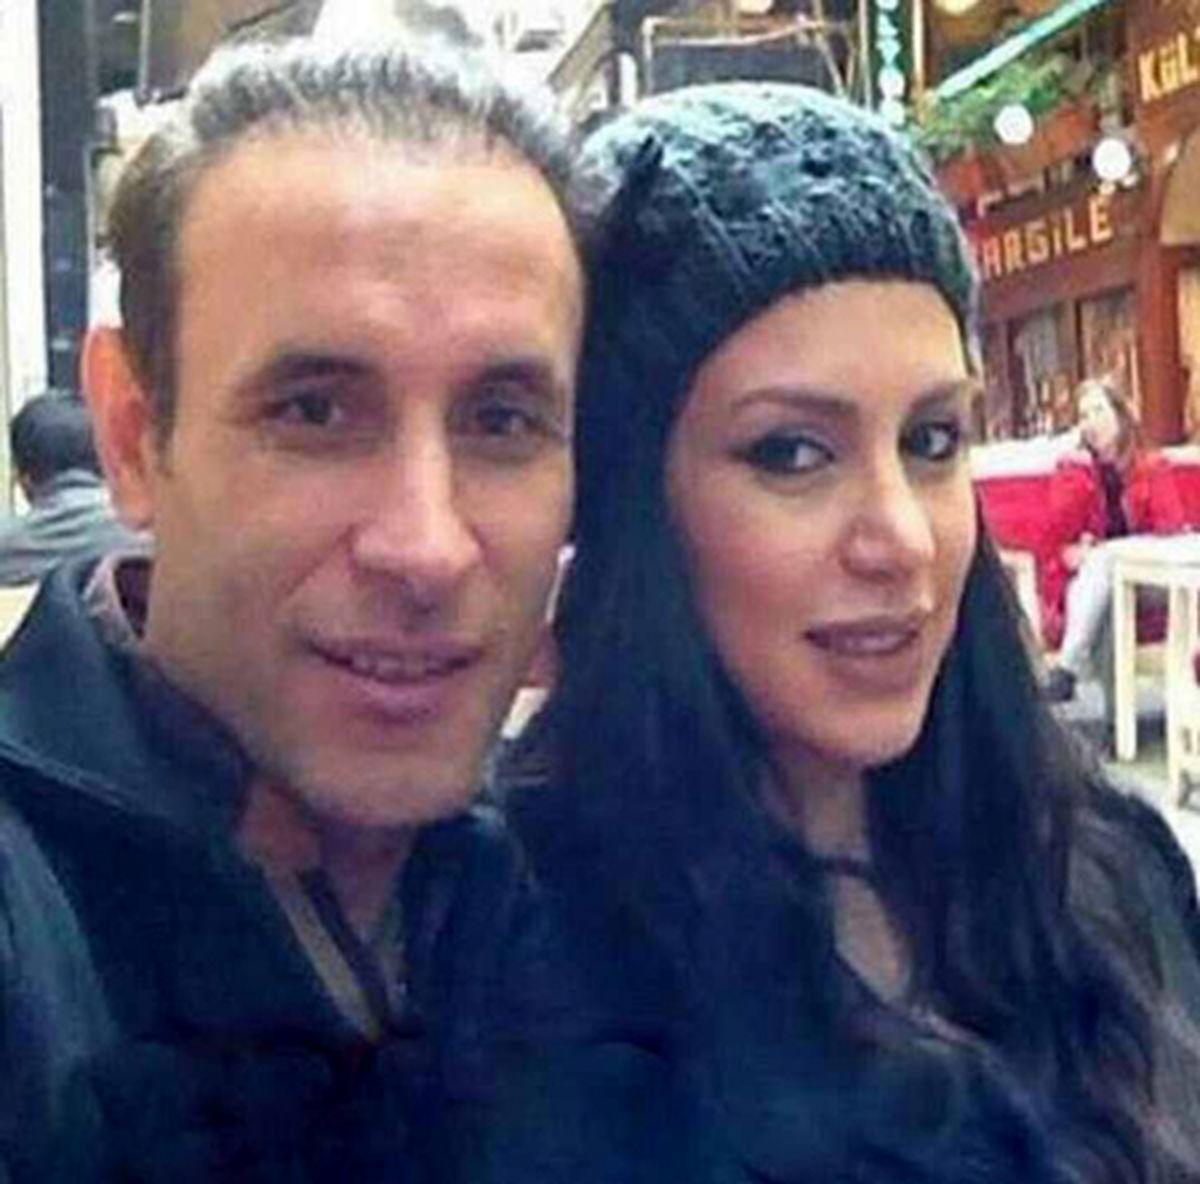 عکس لورفته از یحیی گل محمدی سرمربی پرسپولیس و همسرش در مهمانی + عکس خصوصی